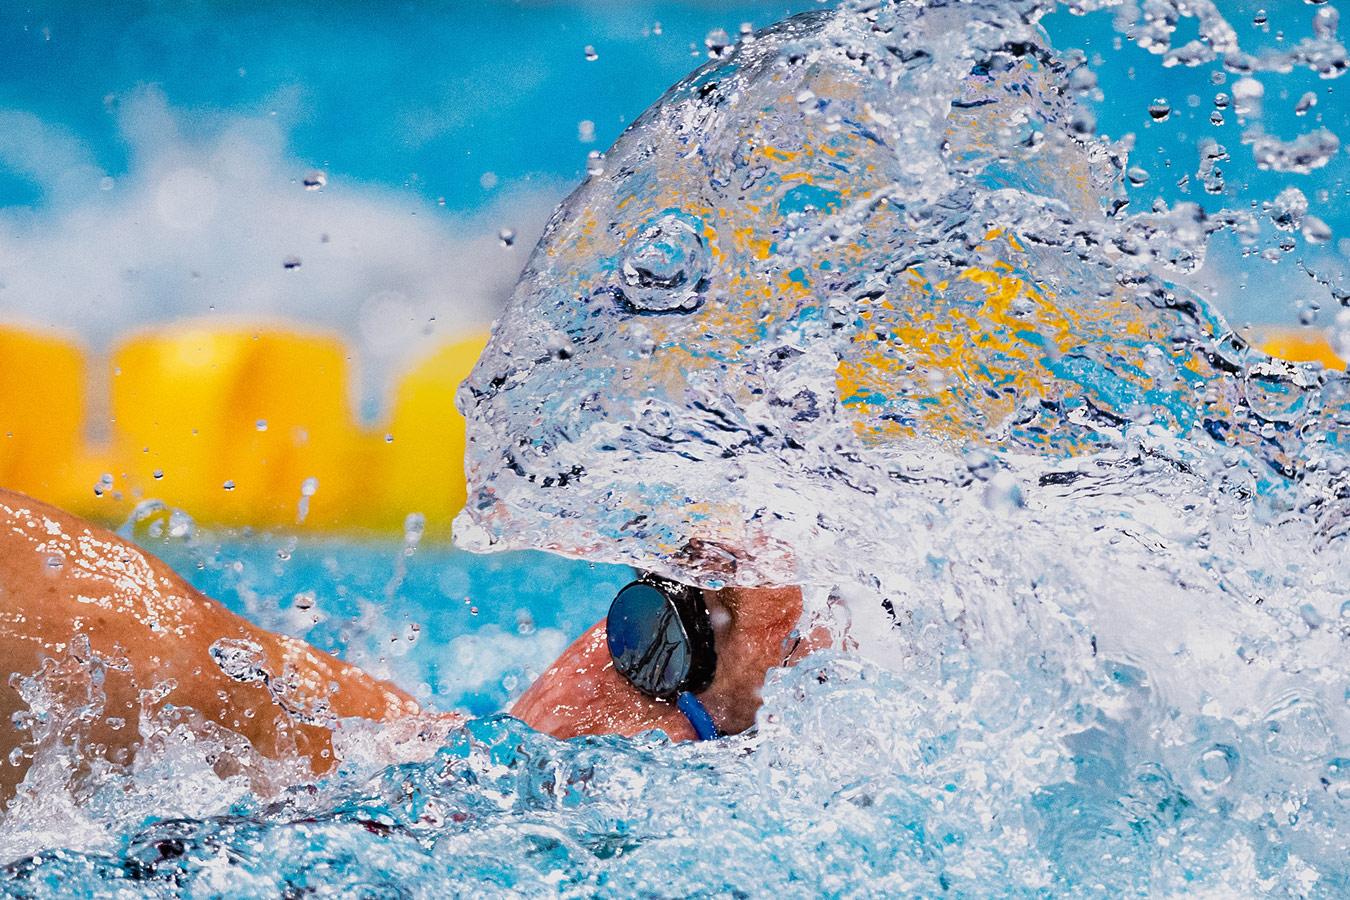 Спортсмен и Животное / Венгрия, © Лукас Шульце, Германия, 1-я премия в категории «Спортивное фото», Фотоконкурс «Стамбул – 2019» — Istanbul